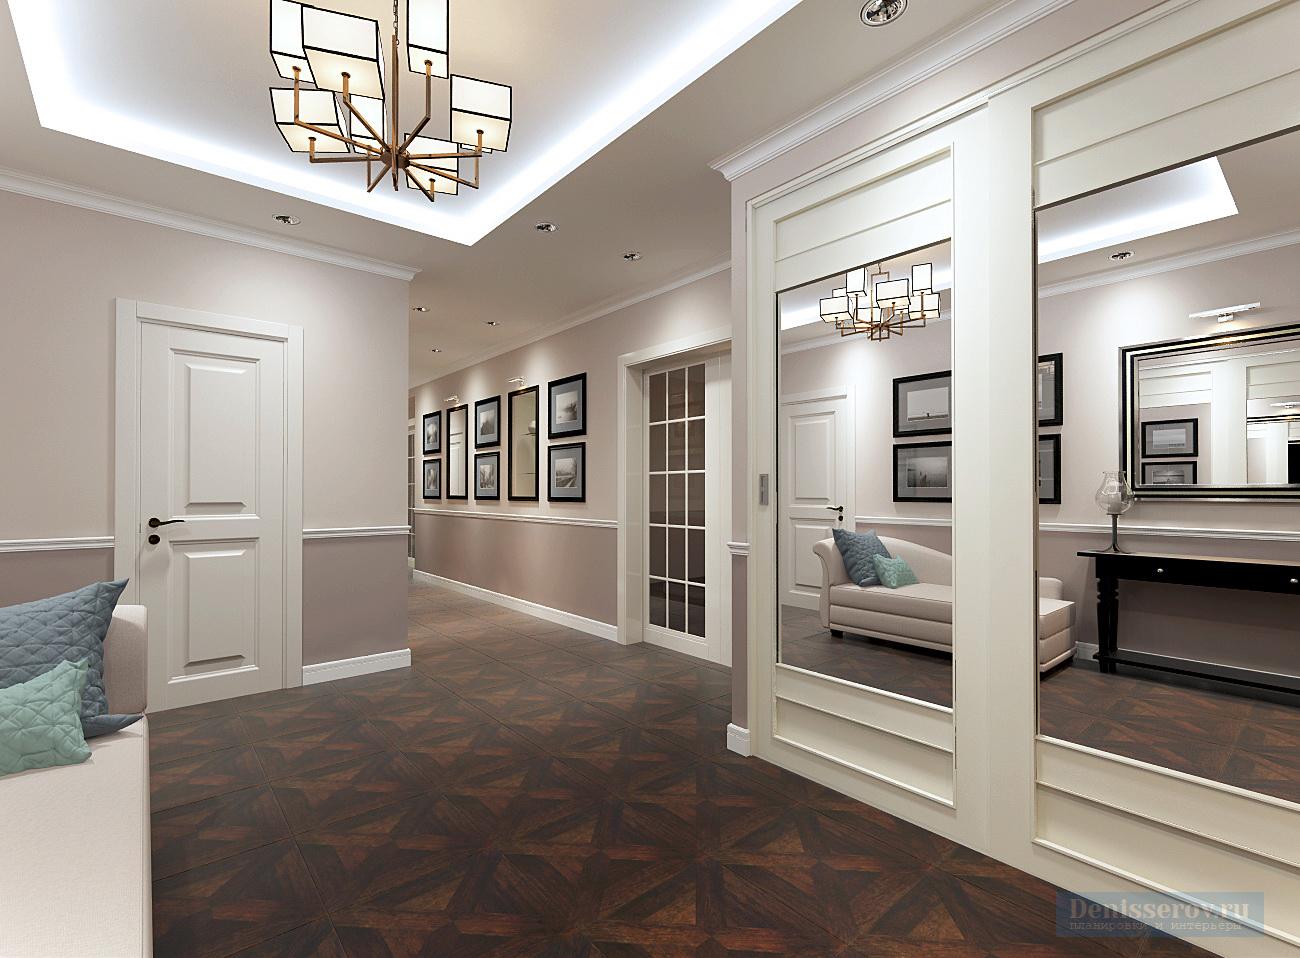 Koridor-holl-v-klassicheskom-stile-20-kv-m-2